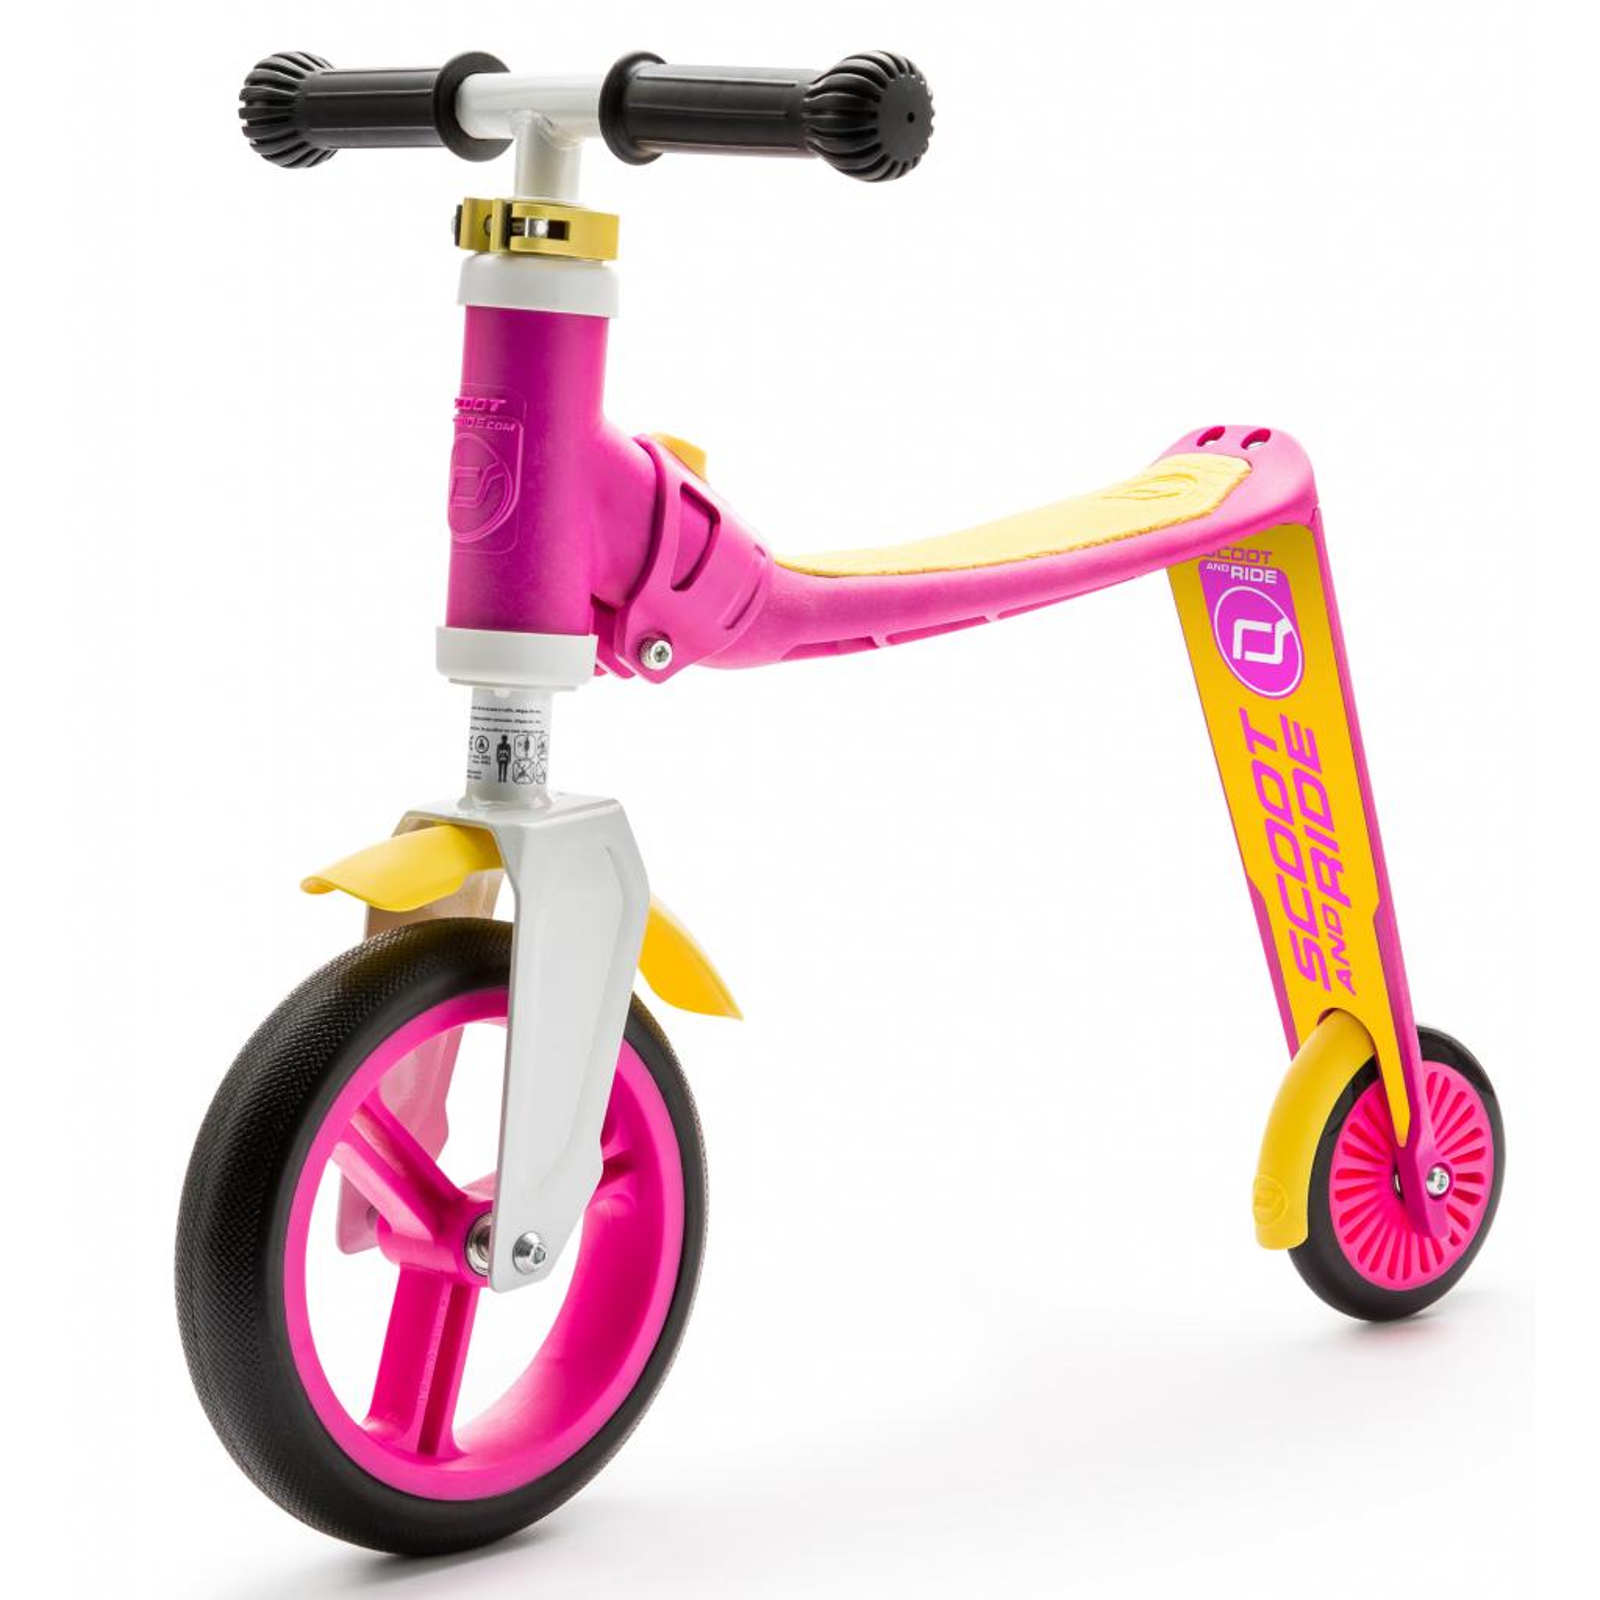 Скутер Scoot&Ride Highwaybaby розово-желтый (SR-216271-PINK-YELLOW)